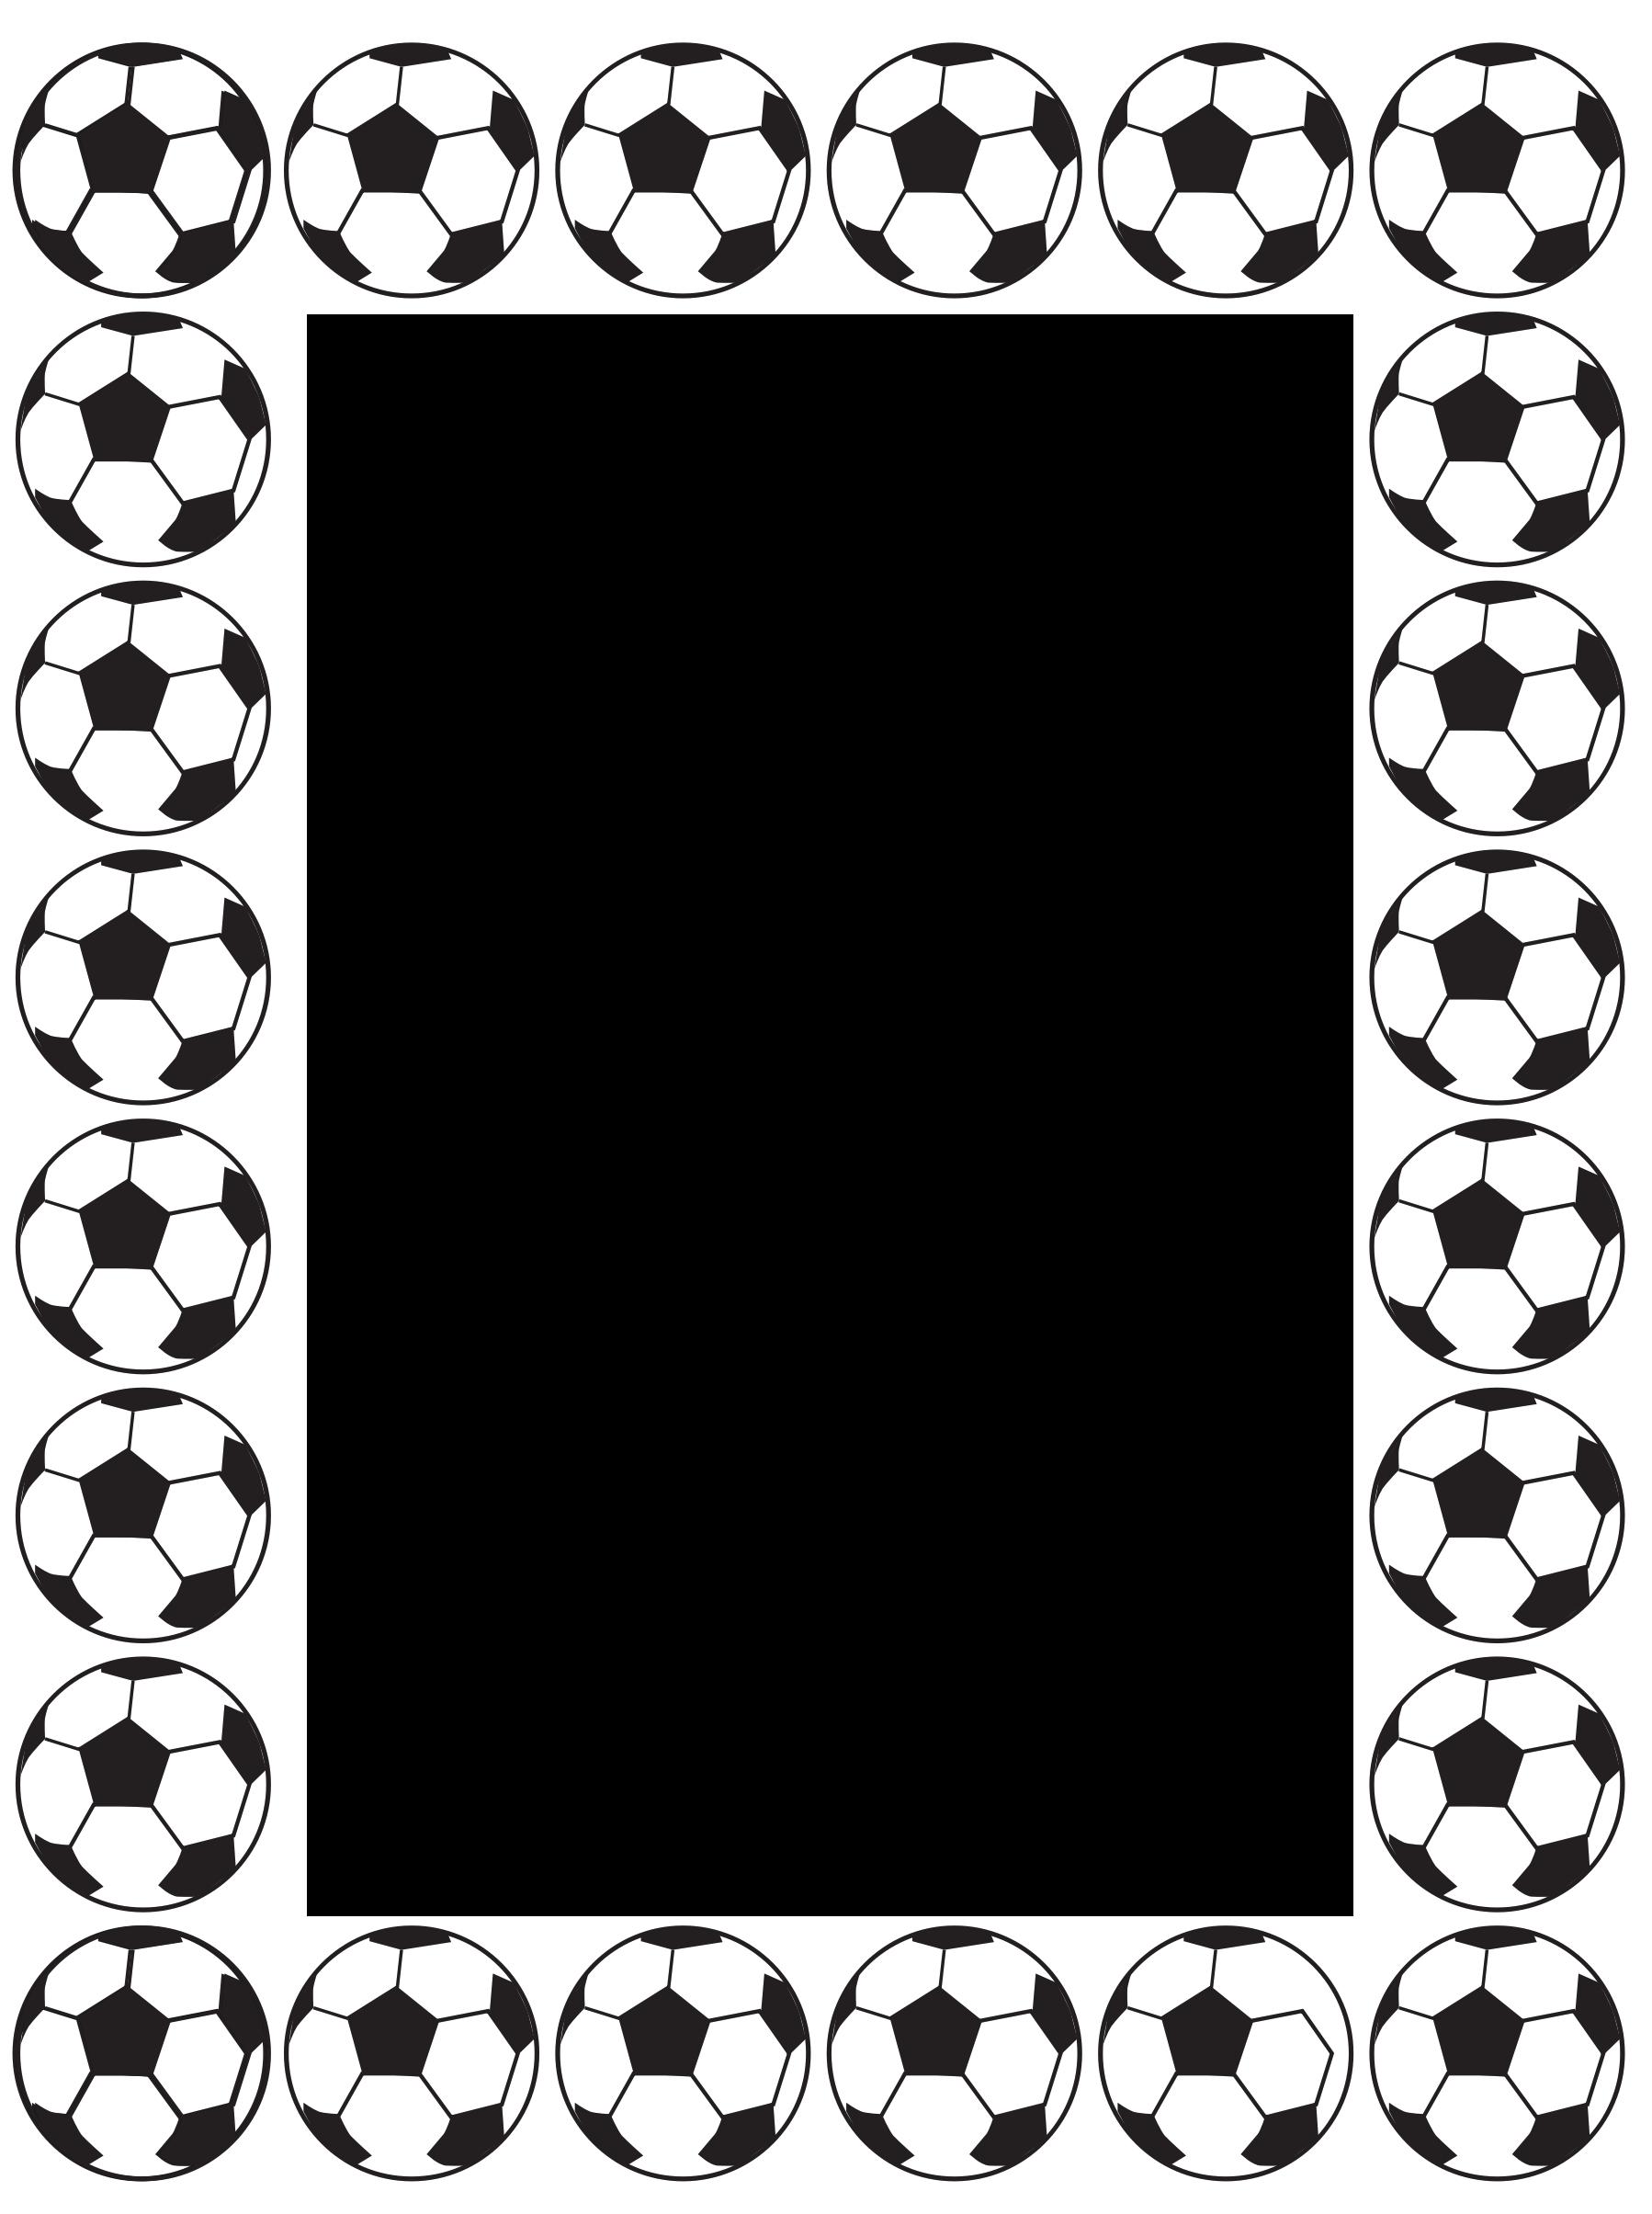 Free Football Frame/ Border